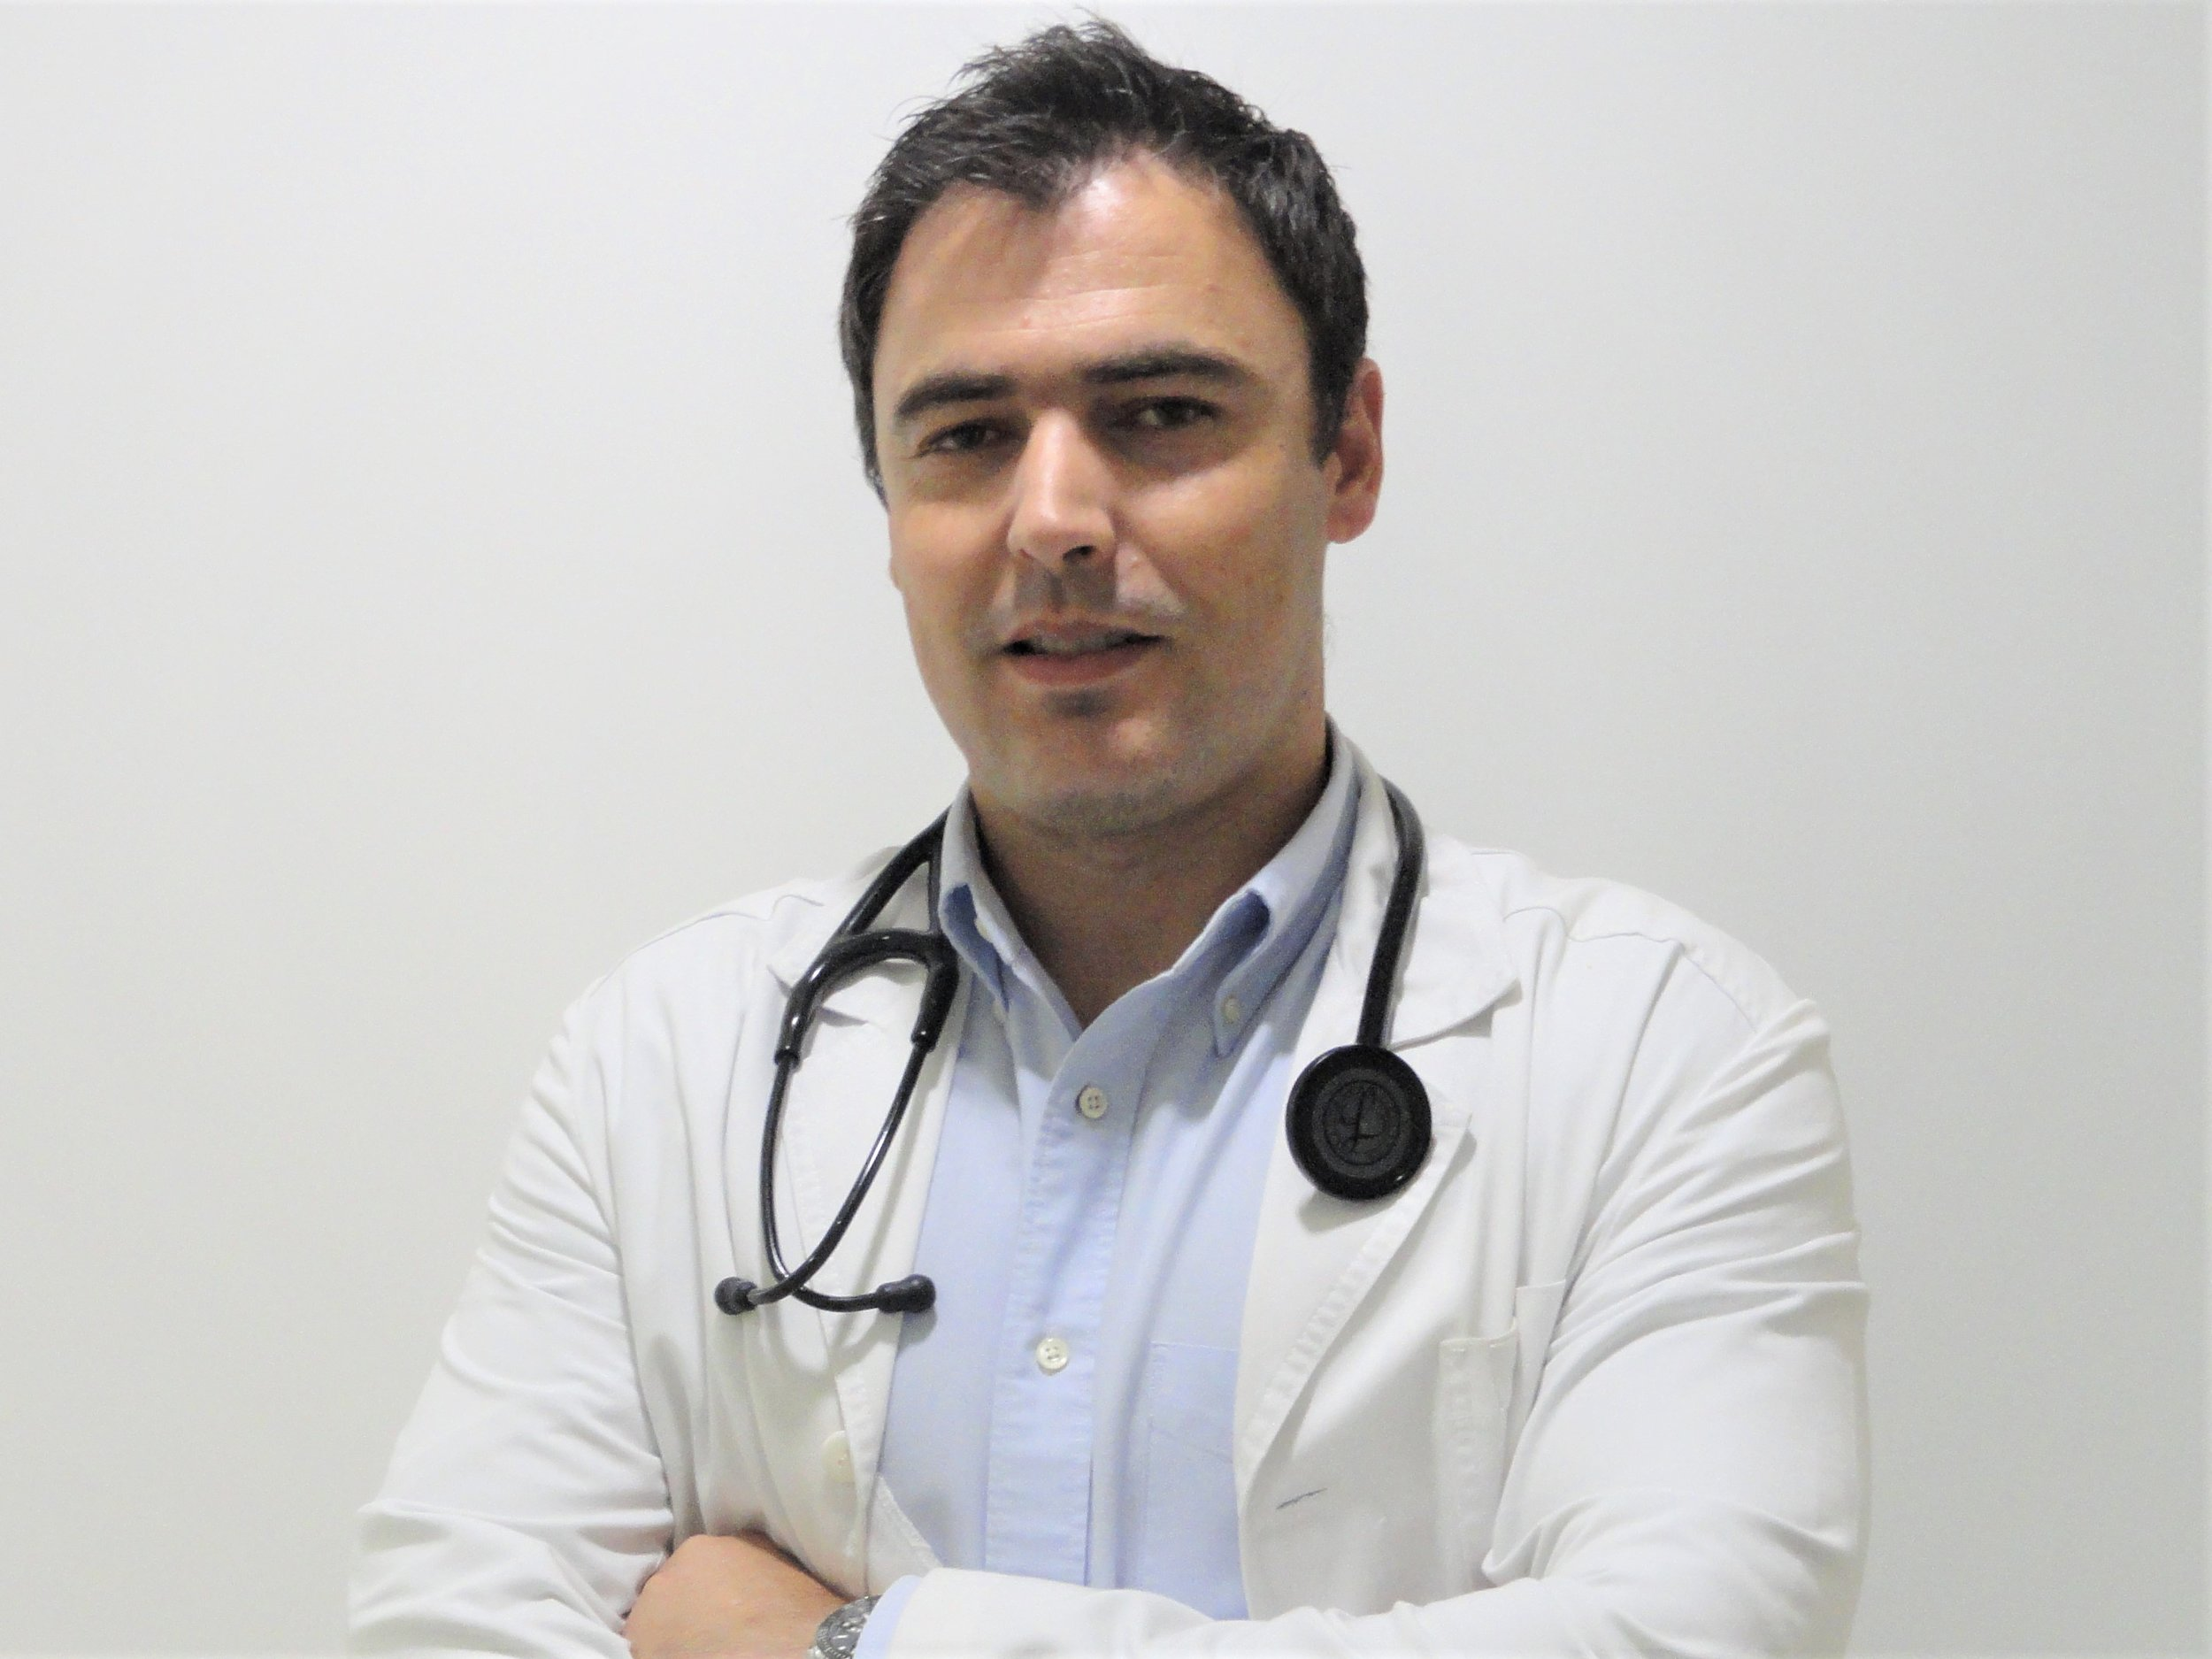 Dr. Hélder Dores copia- Cardiologia (1).jpg